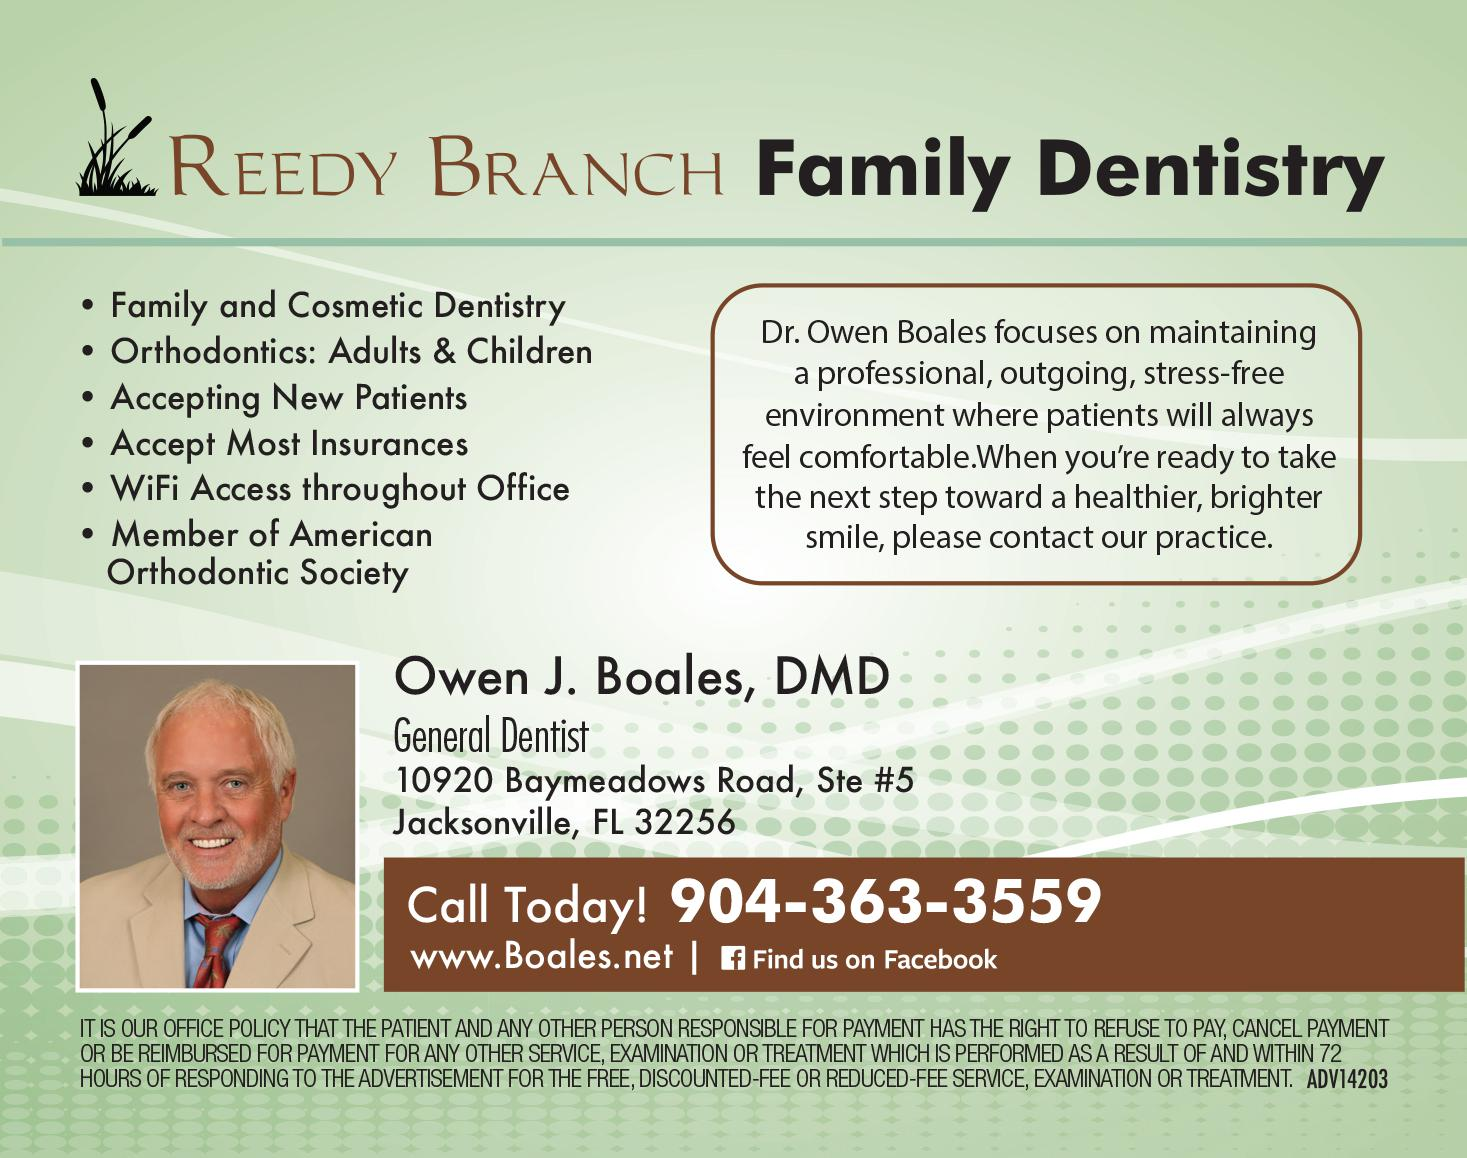 Reedy Branch Family Dentistry